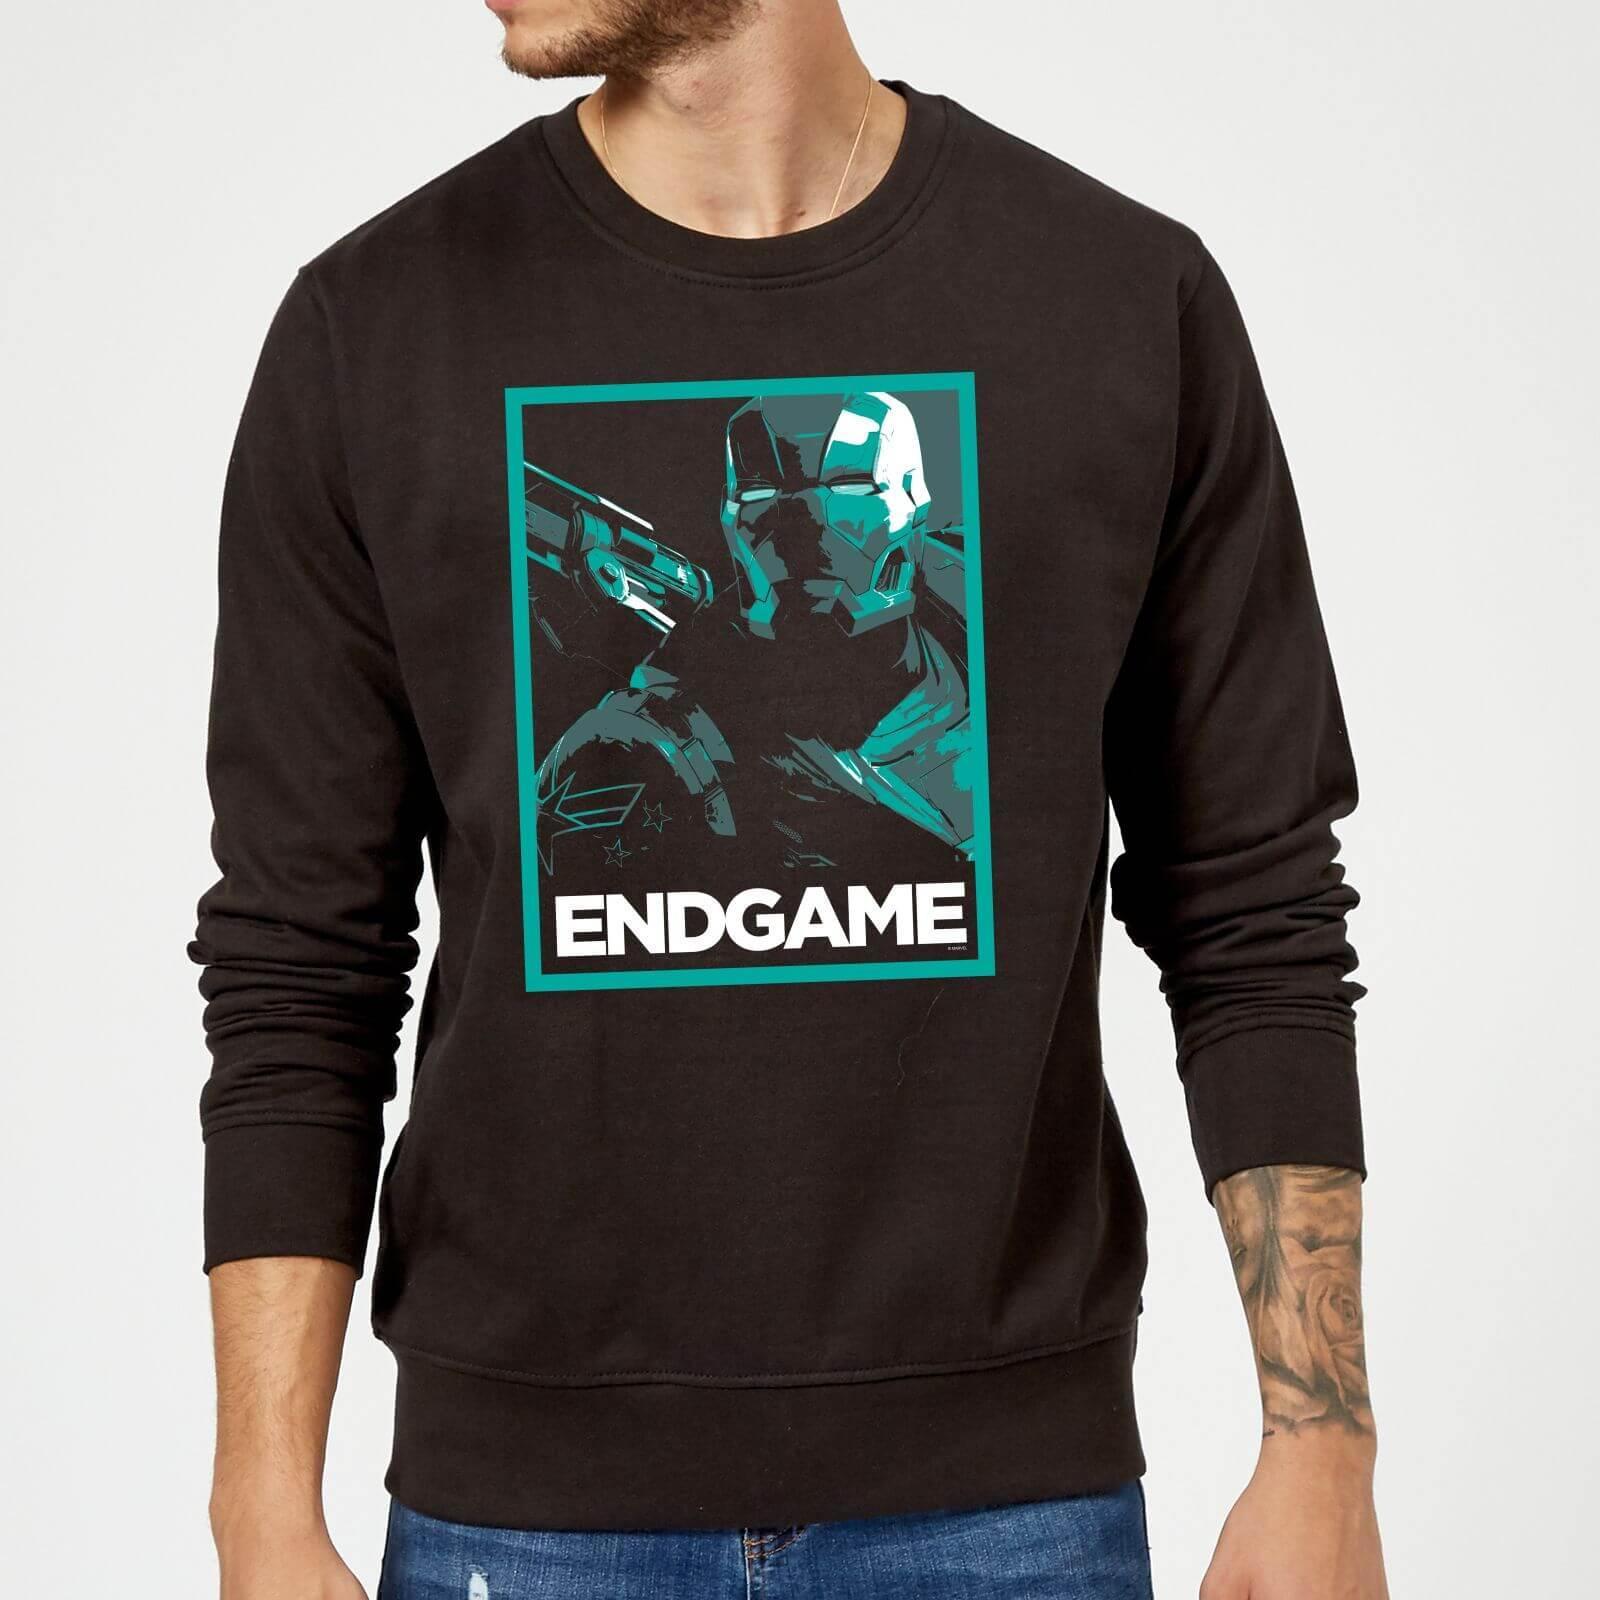 Marvel Avengers Endgame War Machine Poster Sweatshirt - Black - M - Black